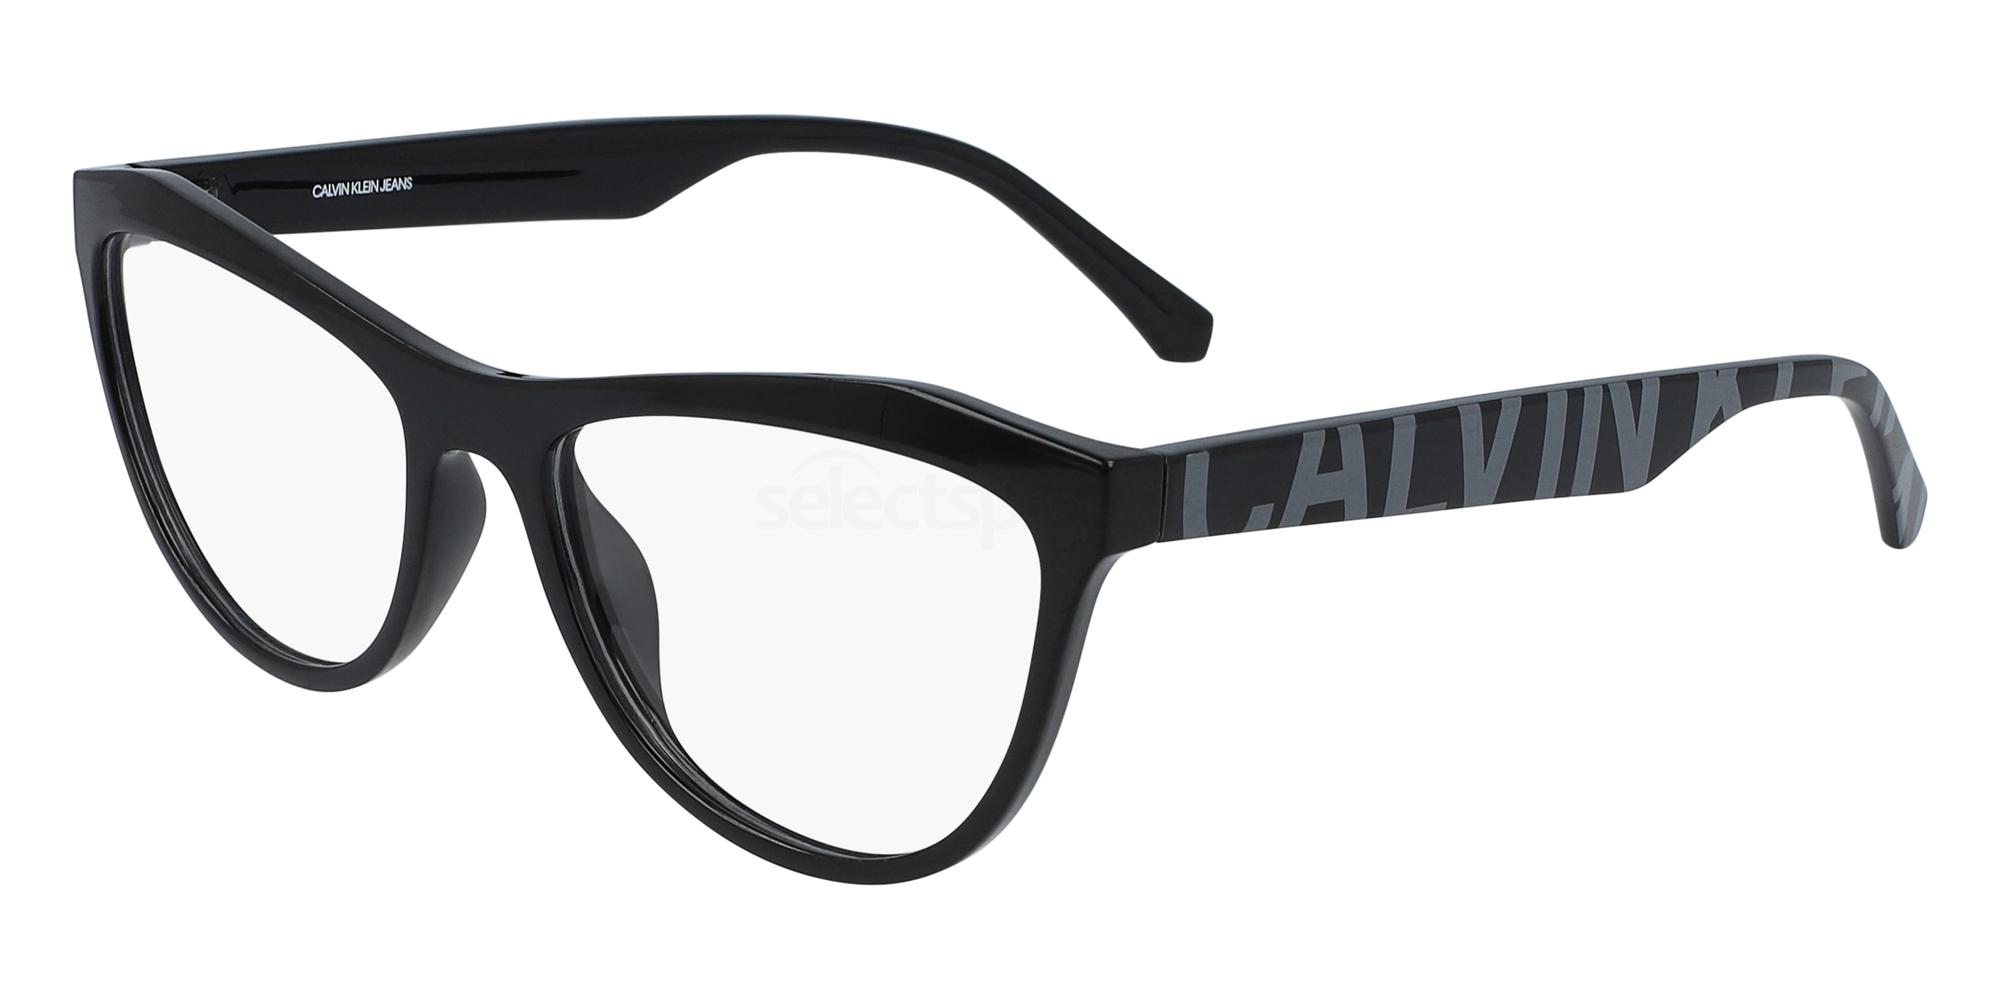 001 CKJ19521 Glasses, Calvin Klein Jeans